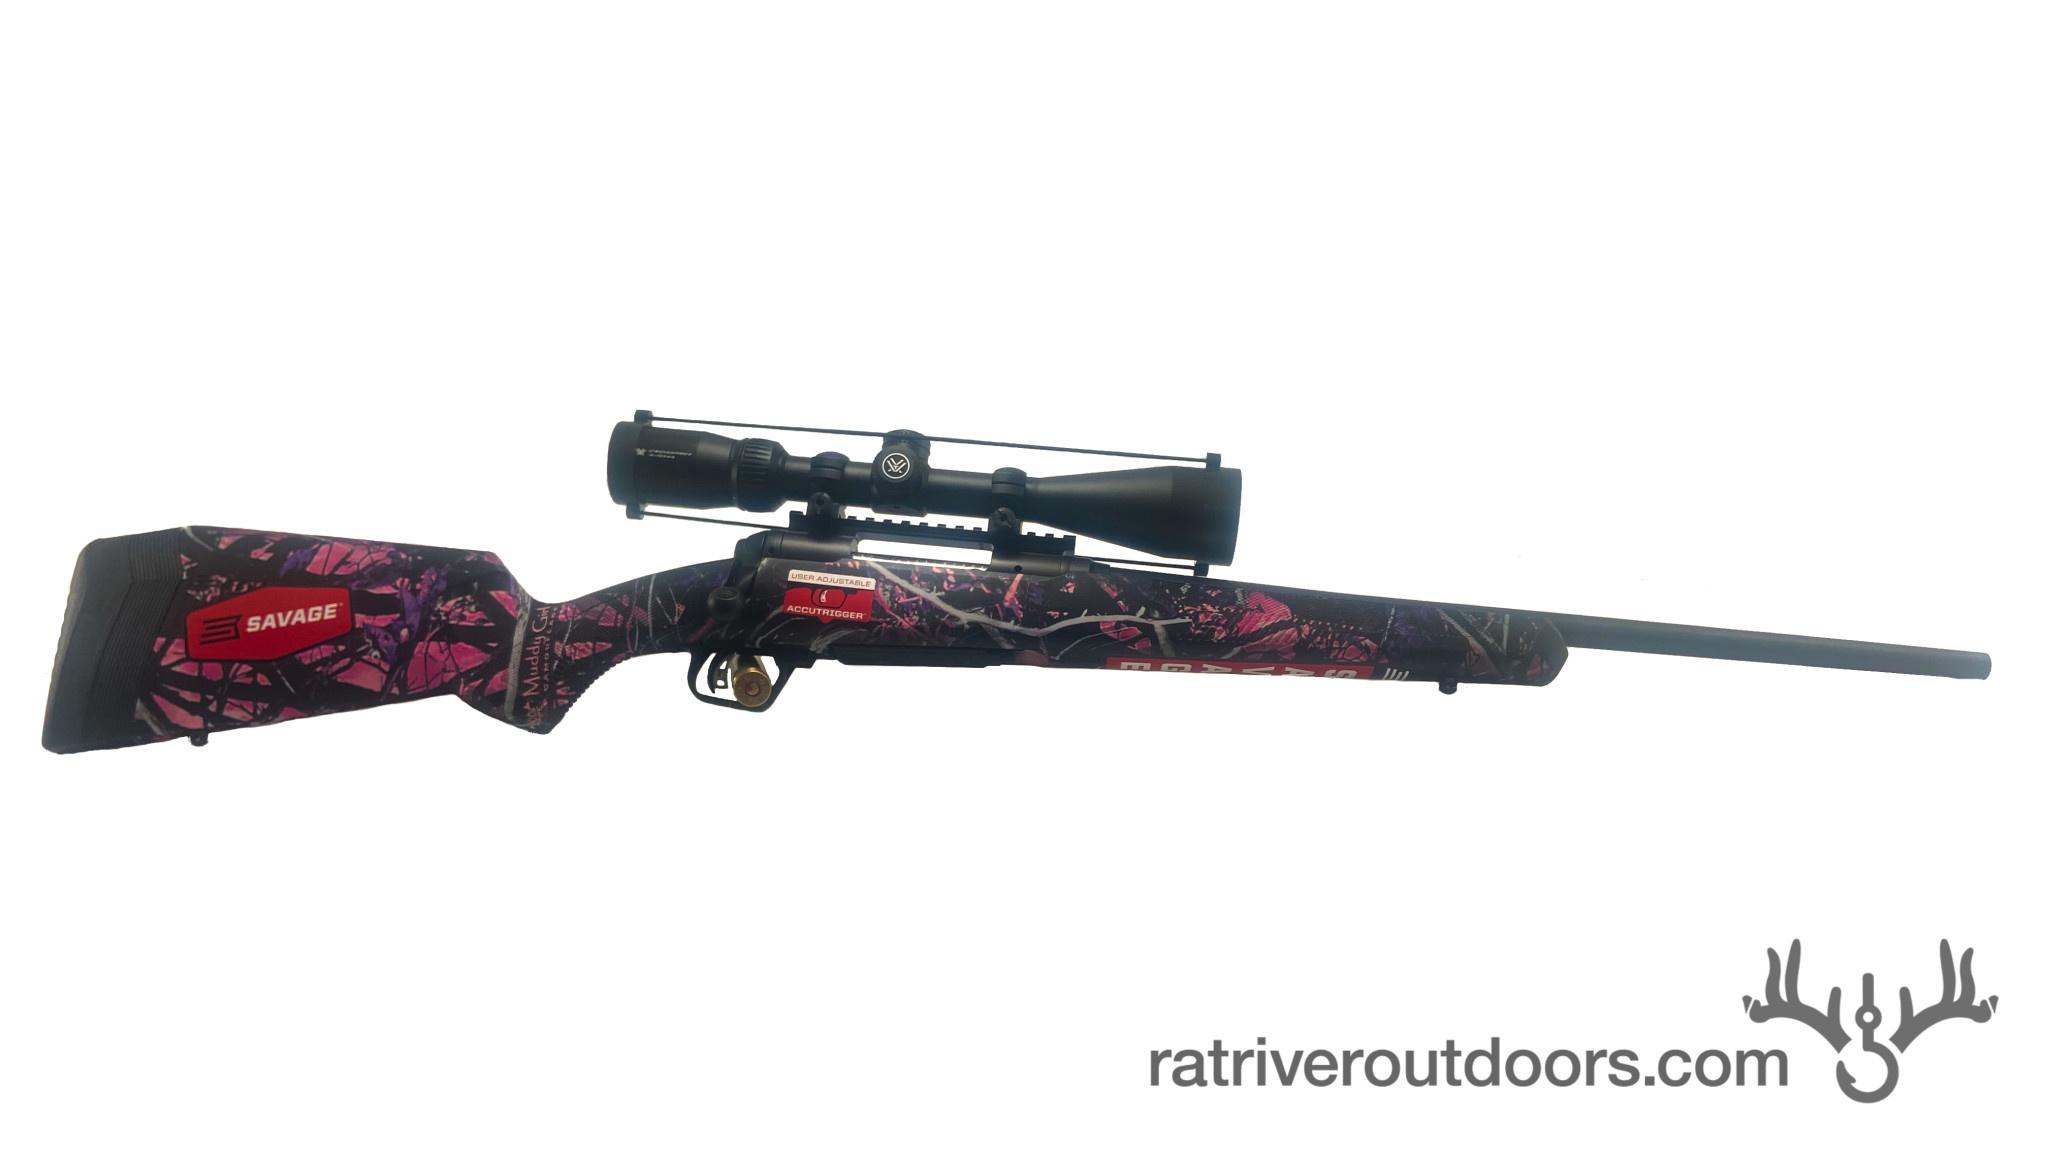 Savage 110 Apex Hunter XP Muddy Girl Camo 7mm-08 Synthetic w/Vortex Crossfire Scope